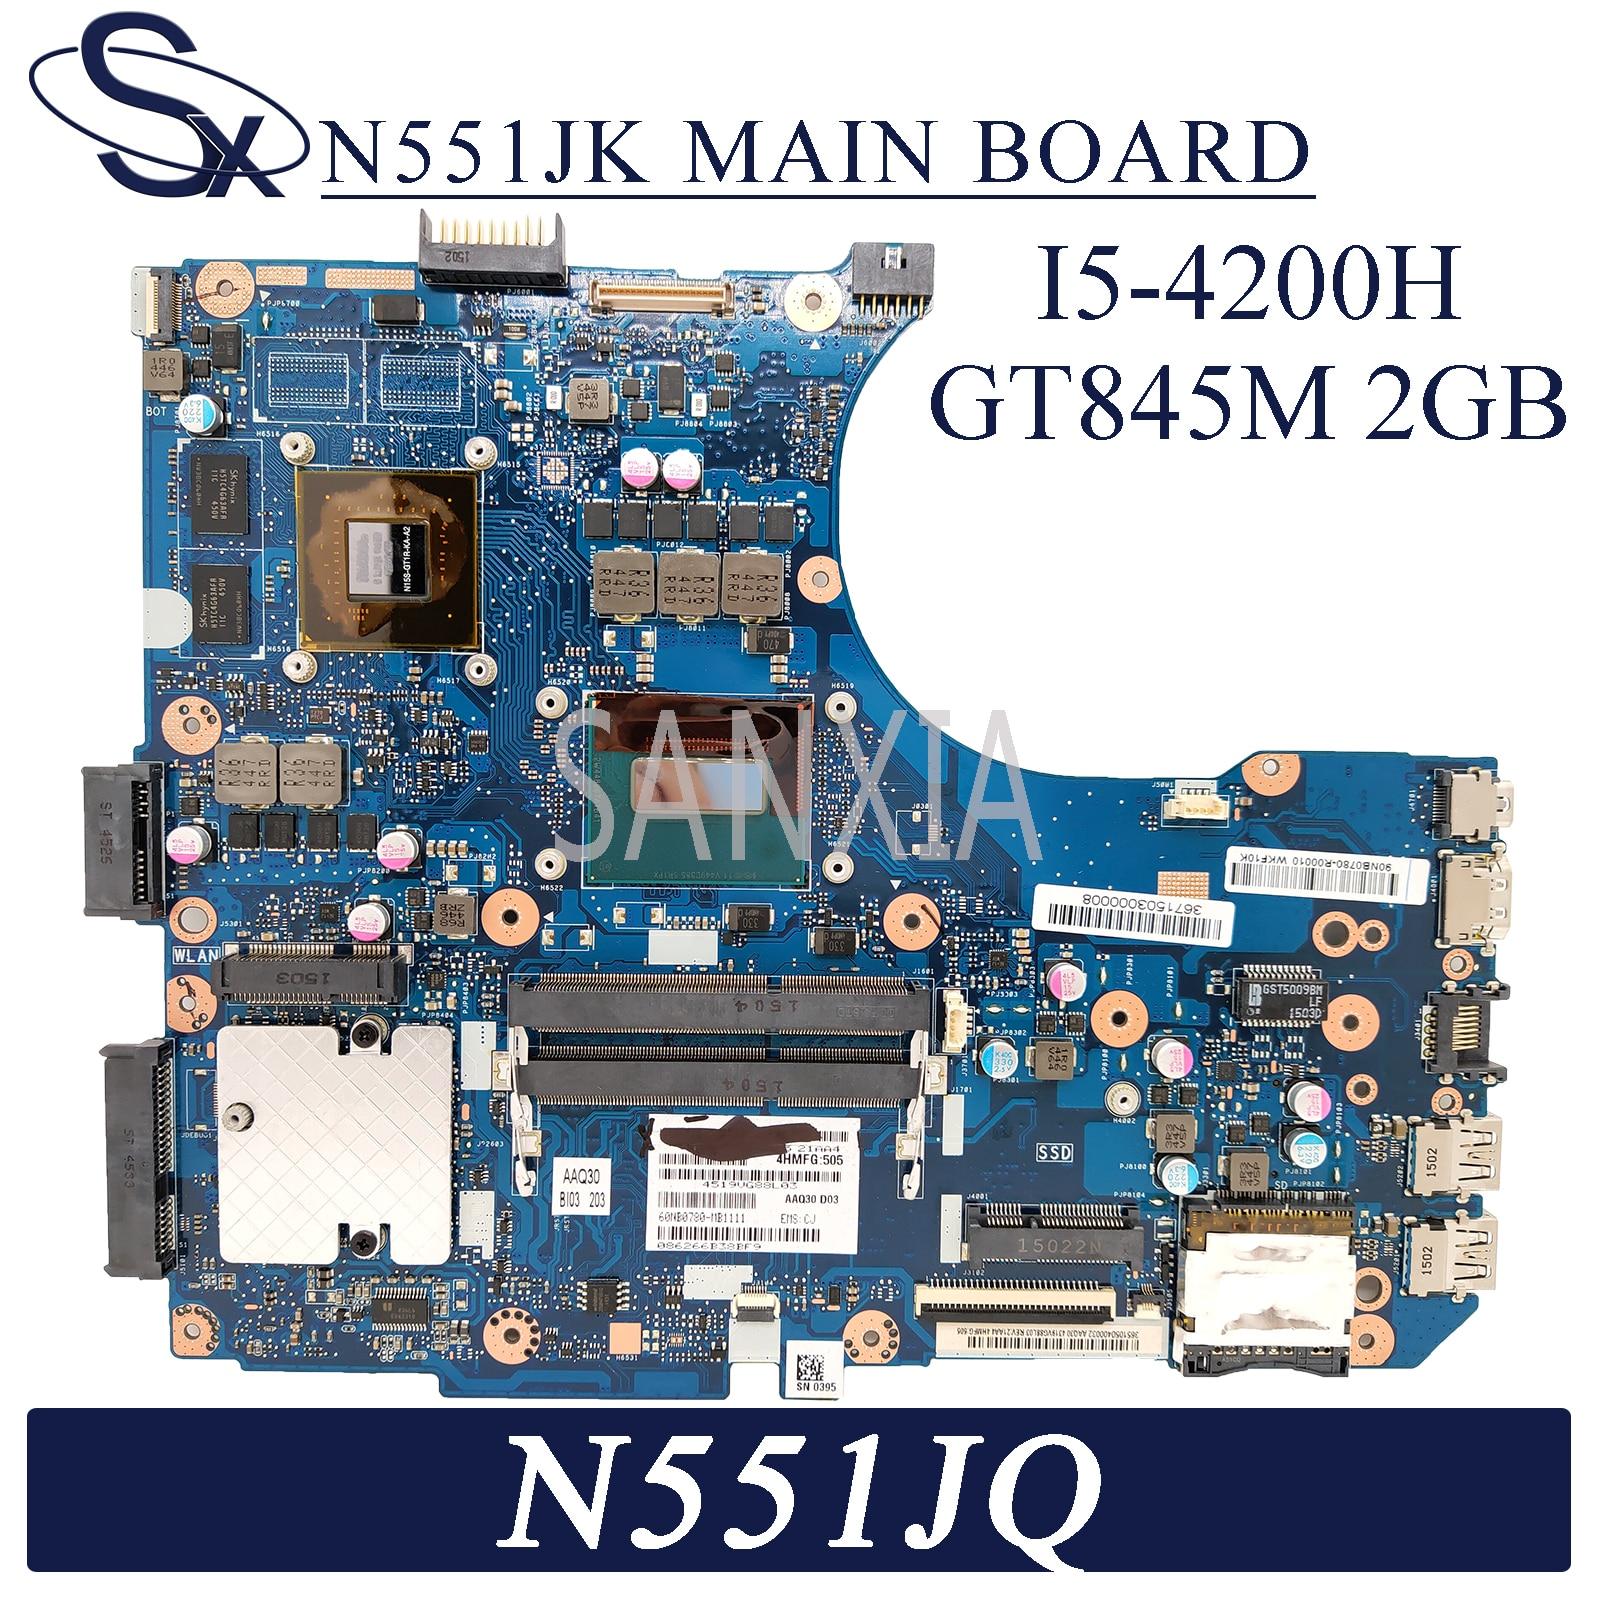 KEFU N551JK اللوحة لابتوب ASUS N551JQ N551JB G551JK G551J N551J اللوحة الأصلية I5-4200H GTX845M-2GB